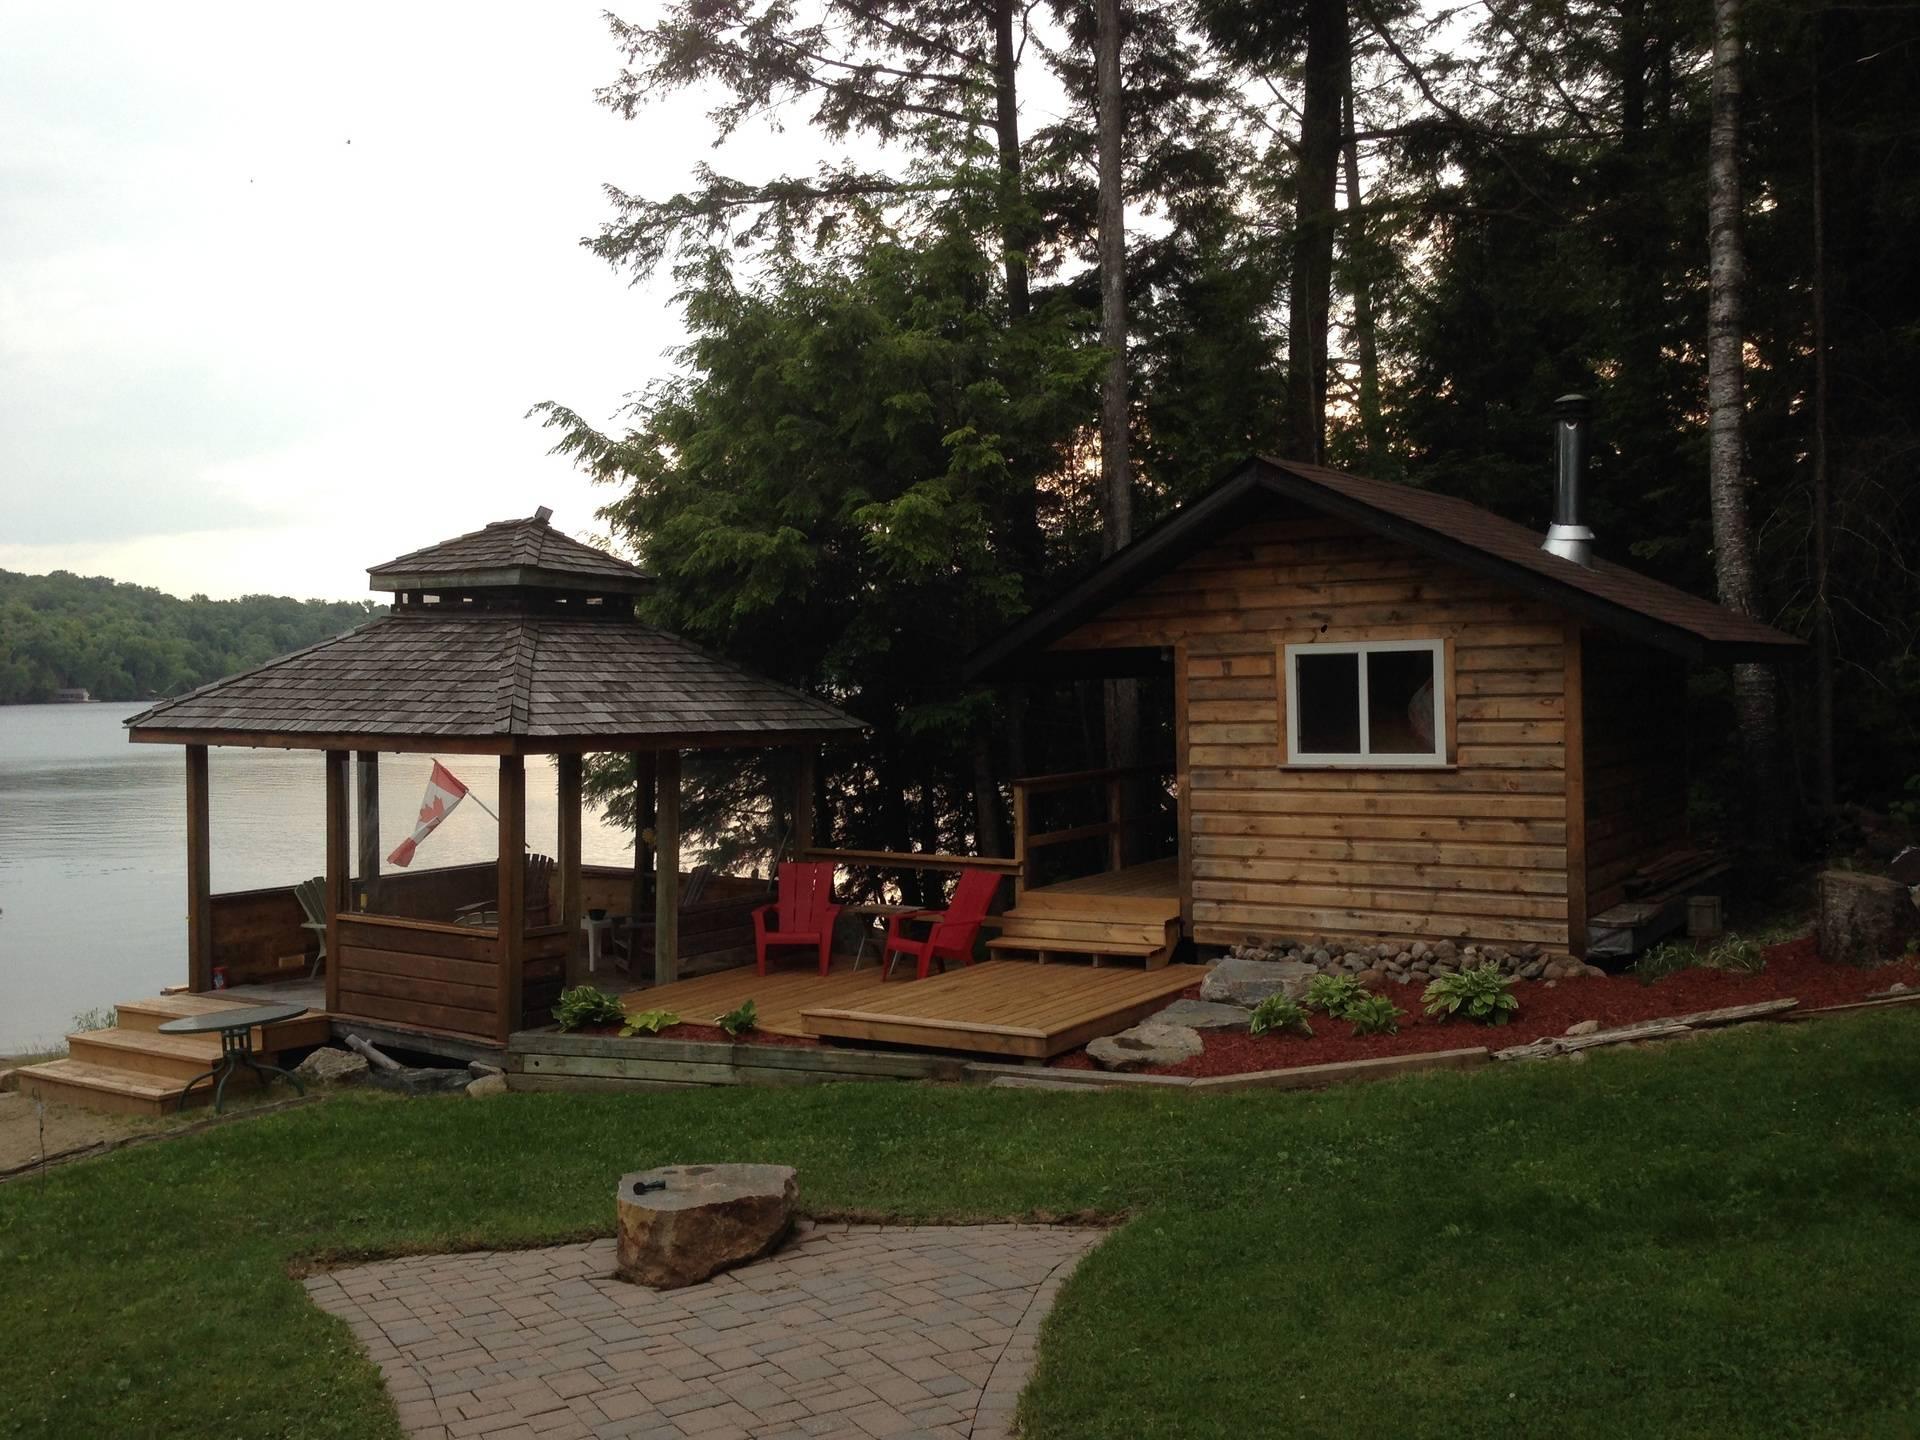 New Sauna and Deck